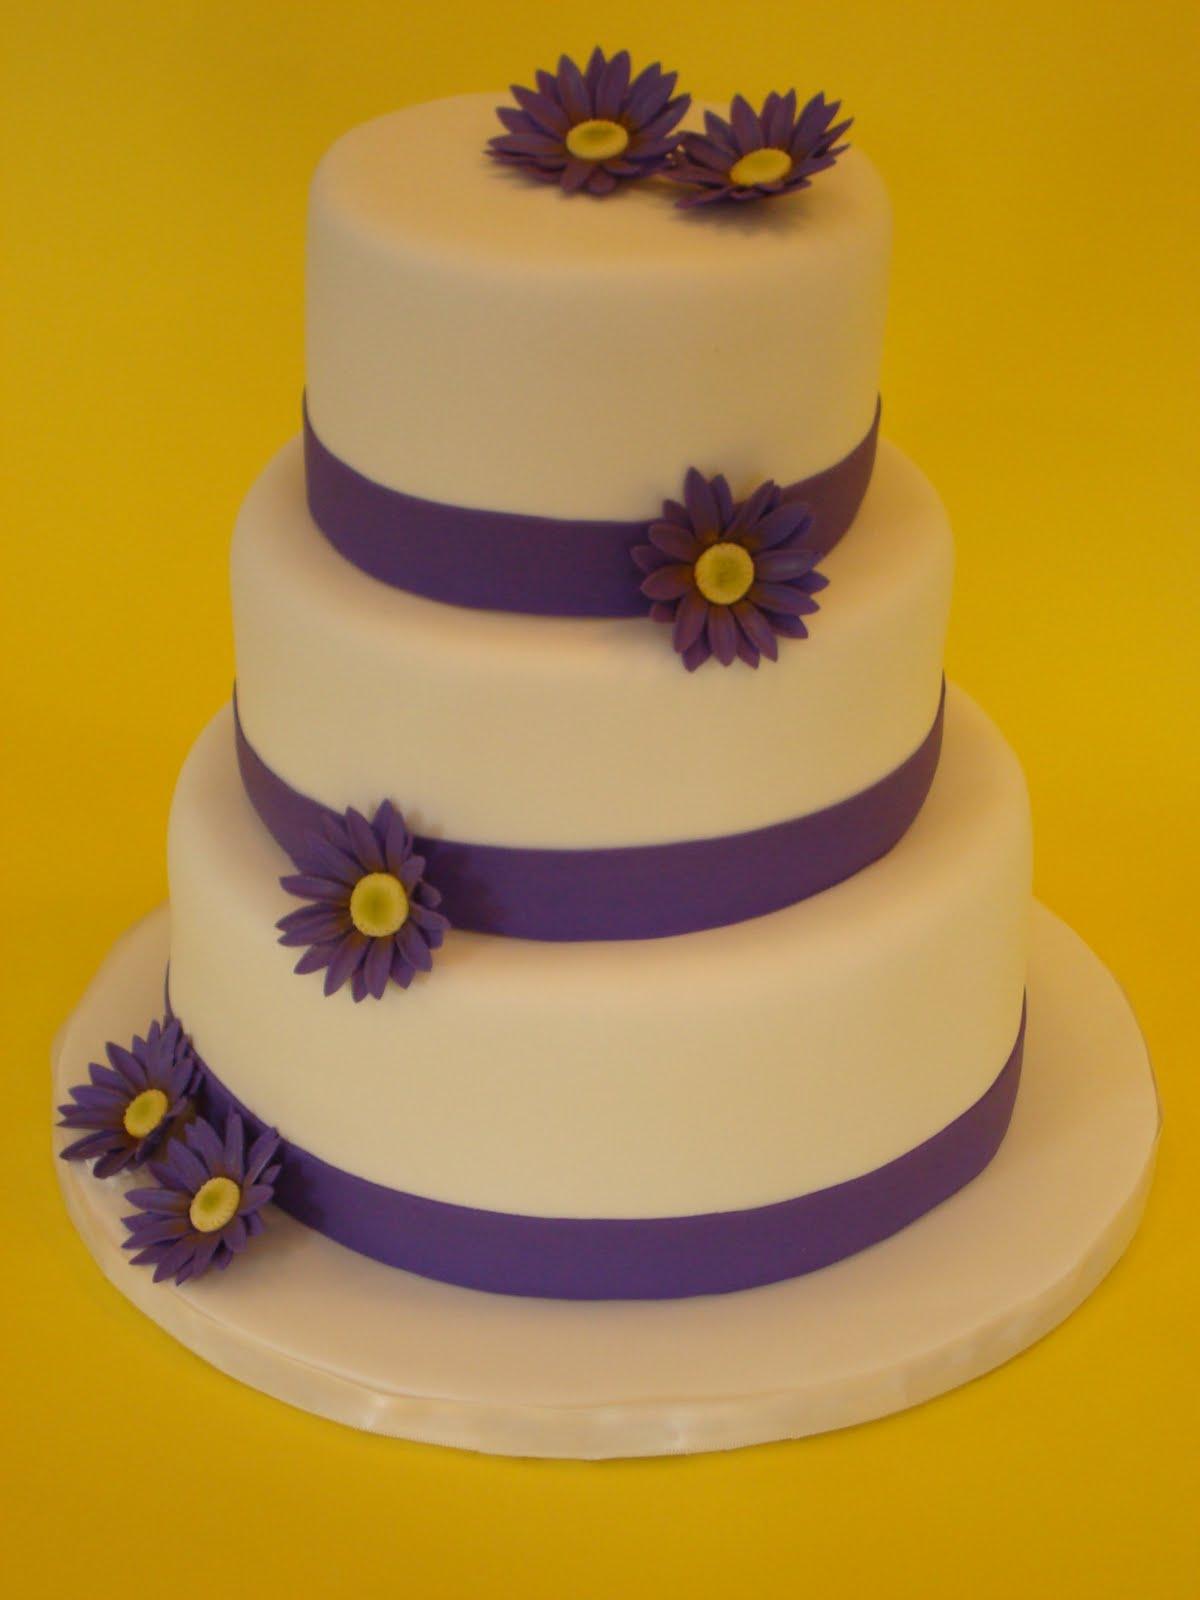 Sweet Grace, Cake Designs: Plum Daisy Wedding Cake